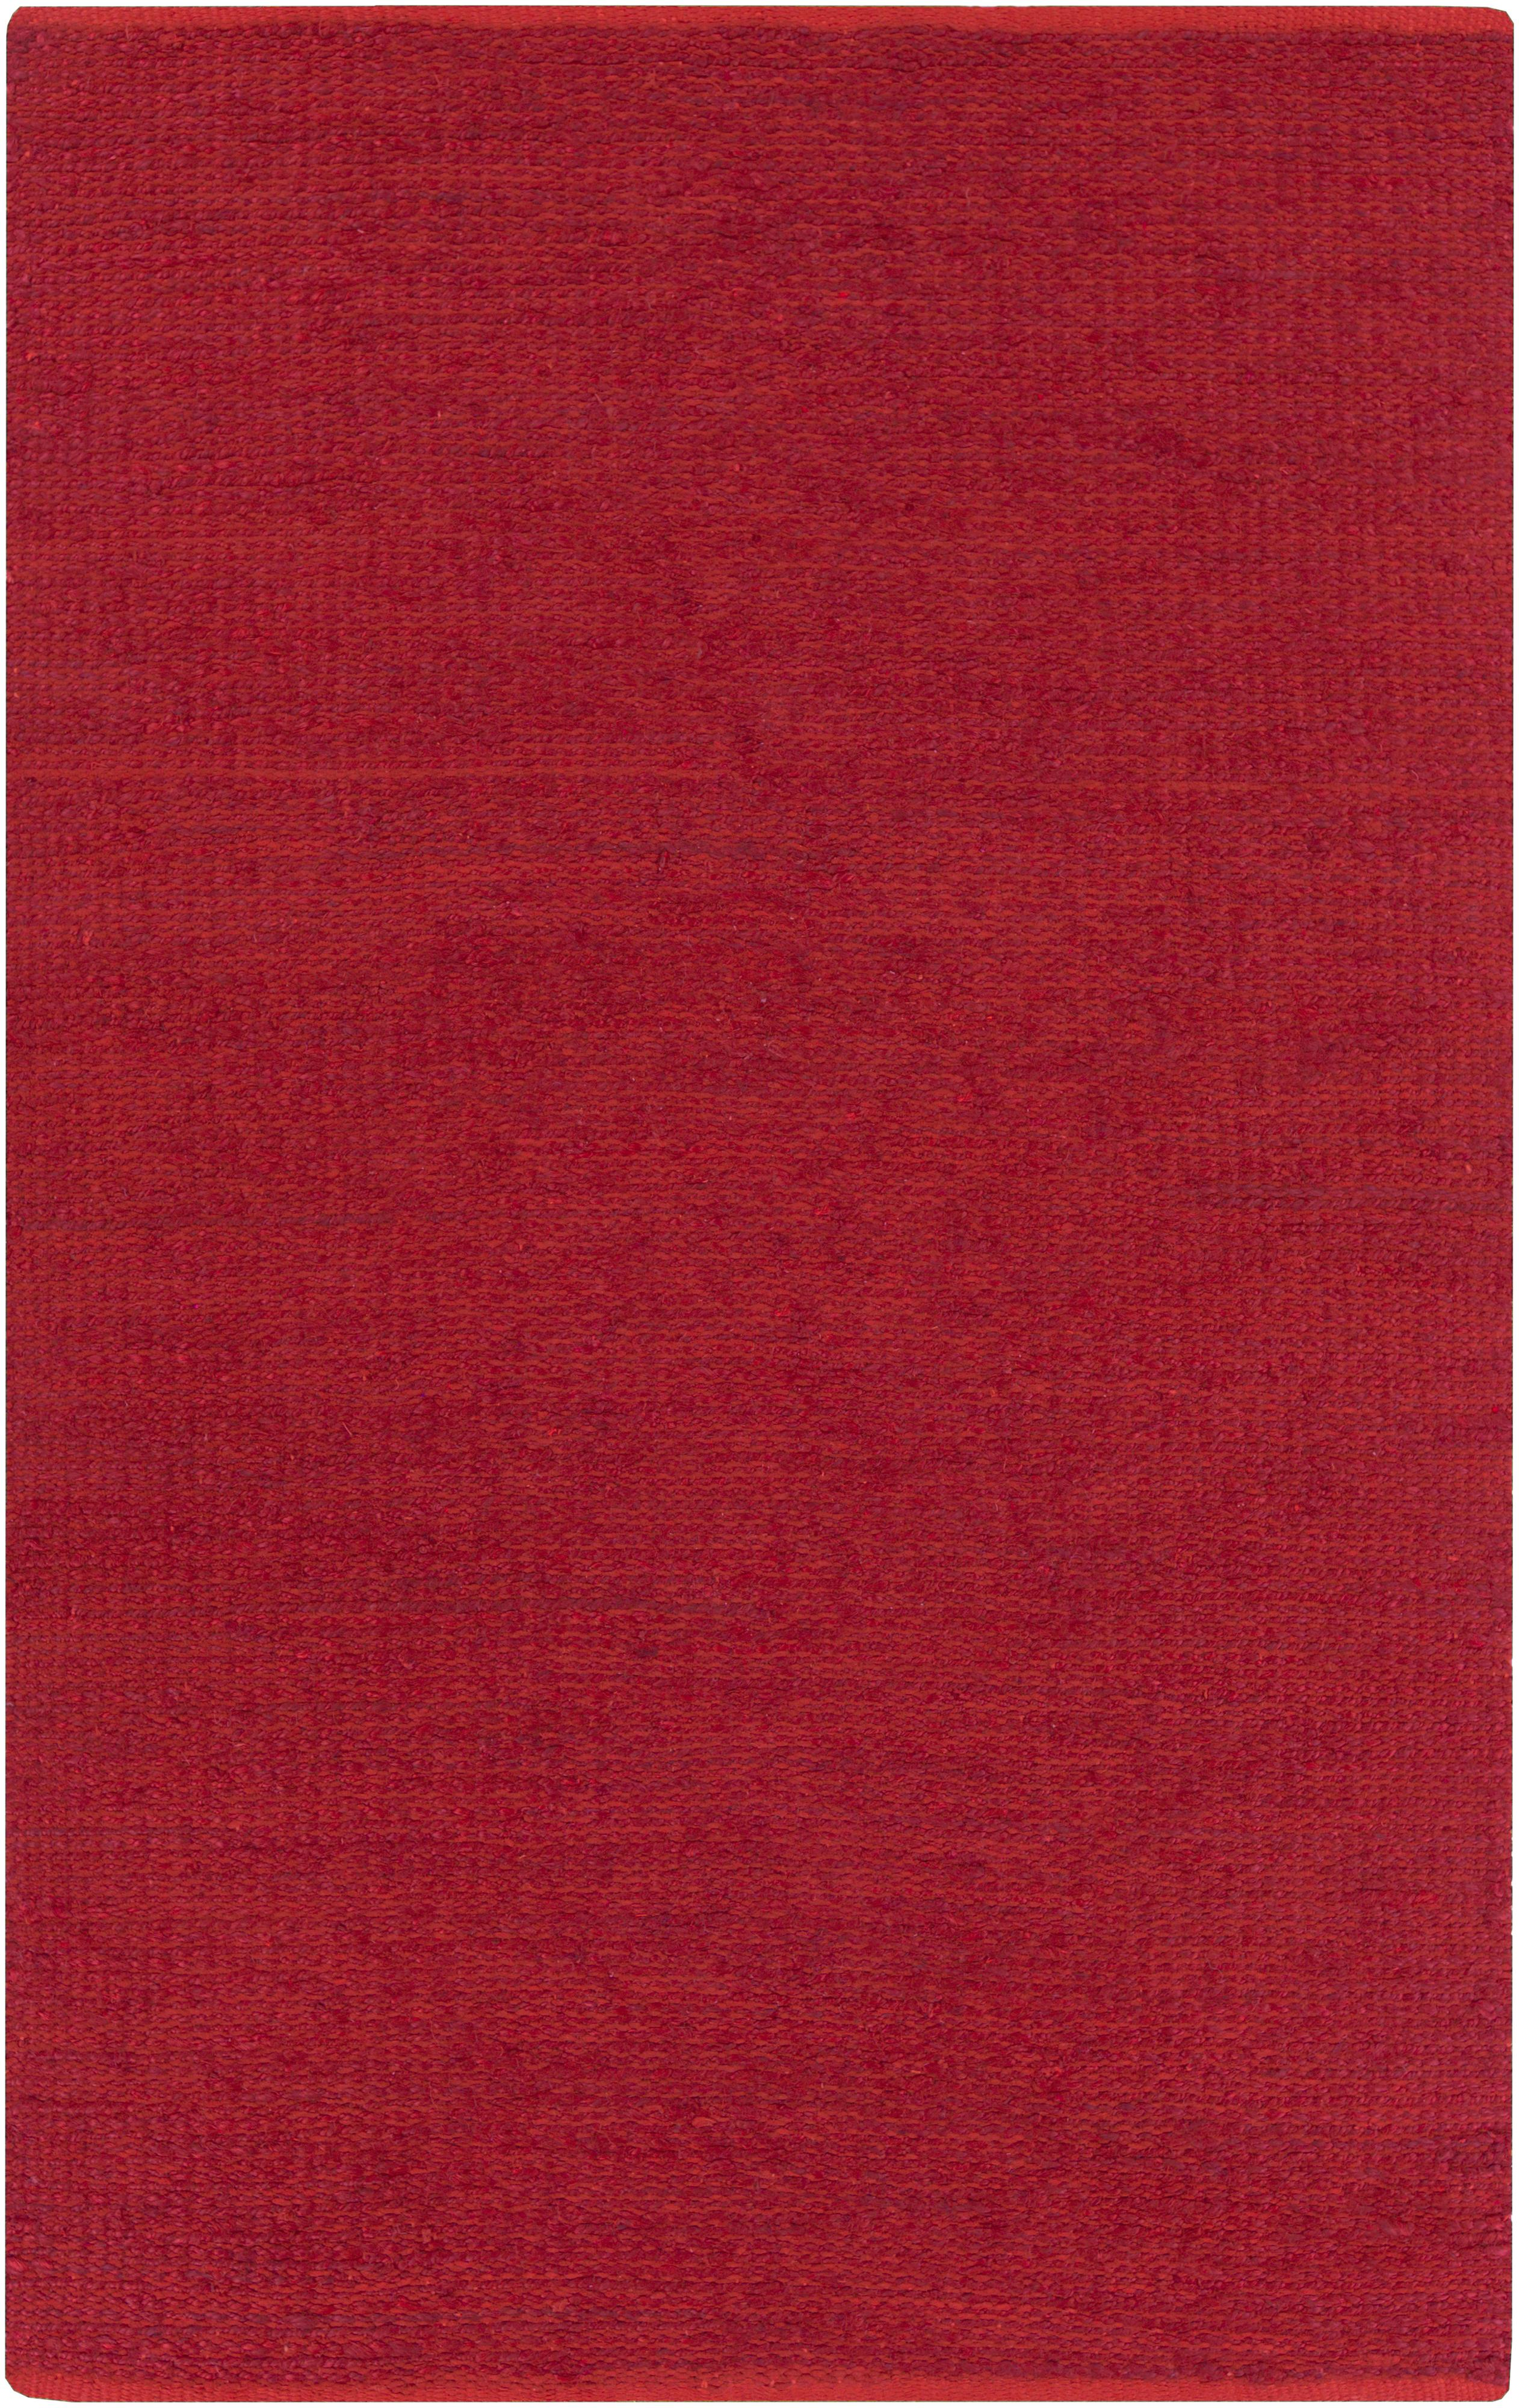 Surya Rugs Tonga 2' x 3' - Item Number: TGA6003-23